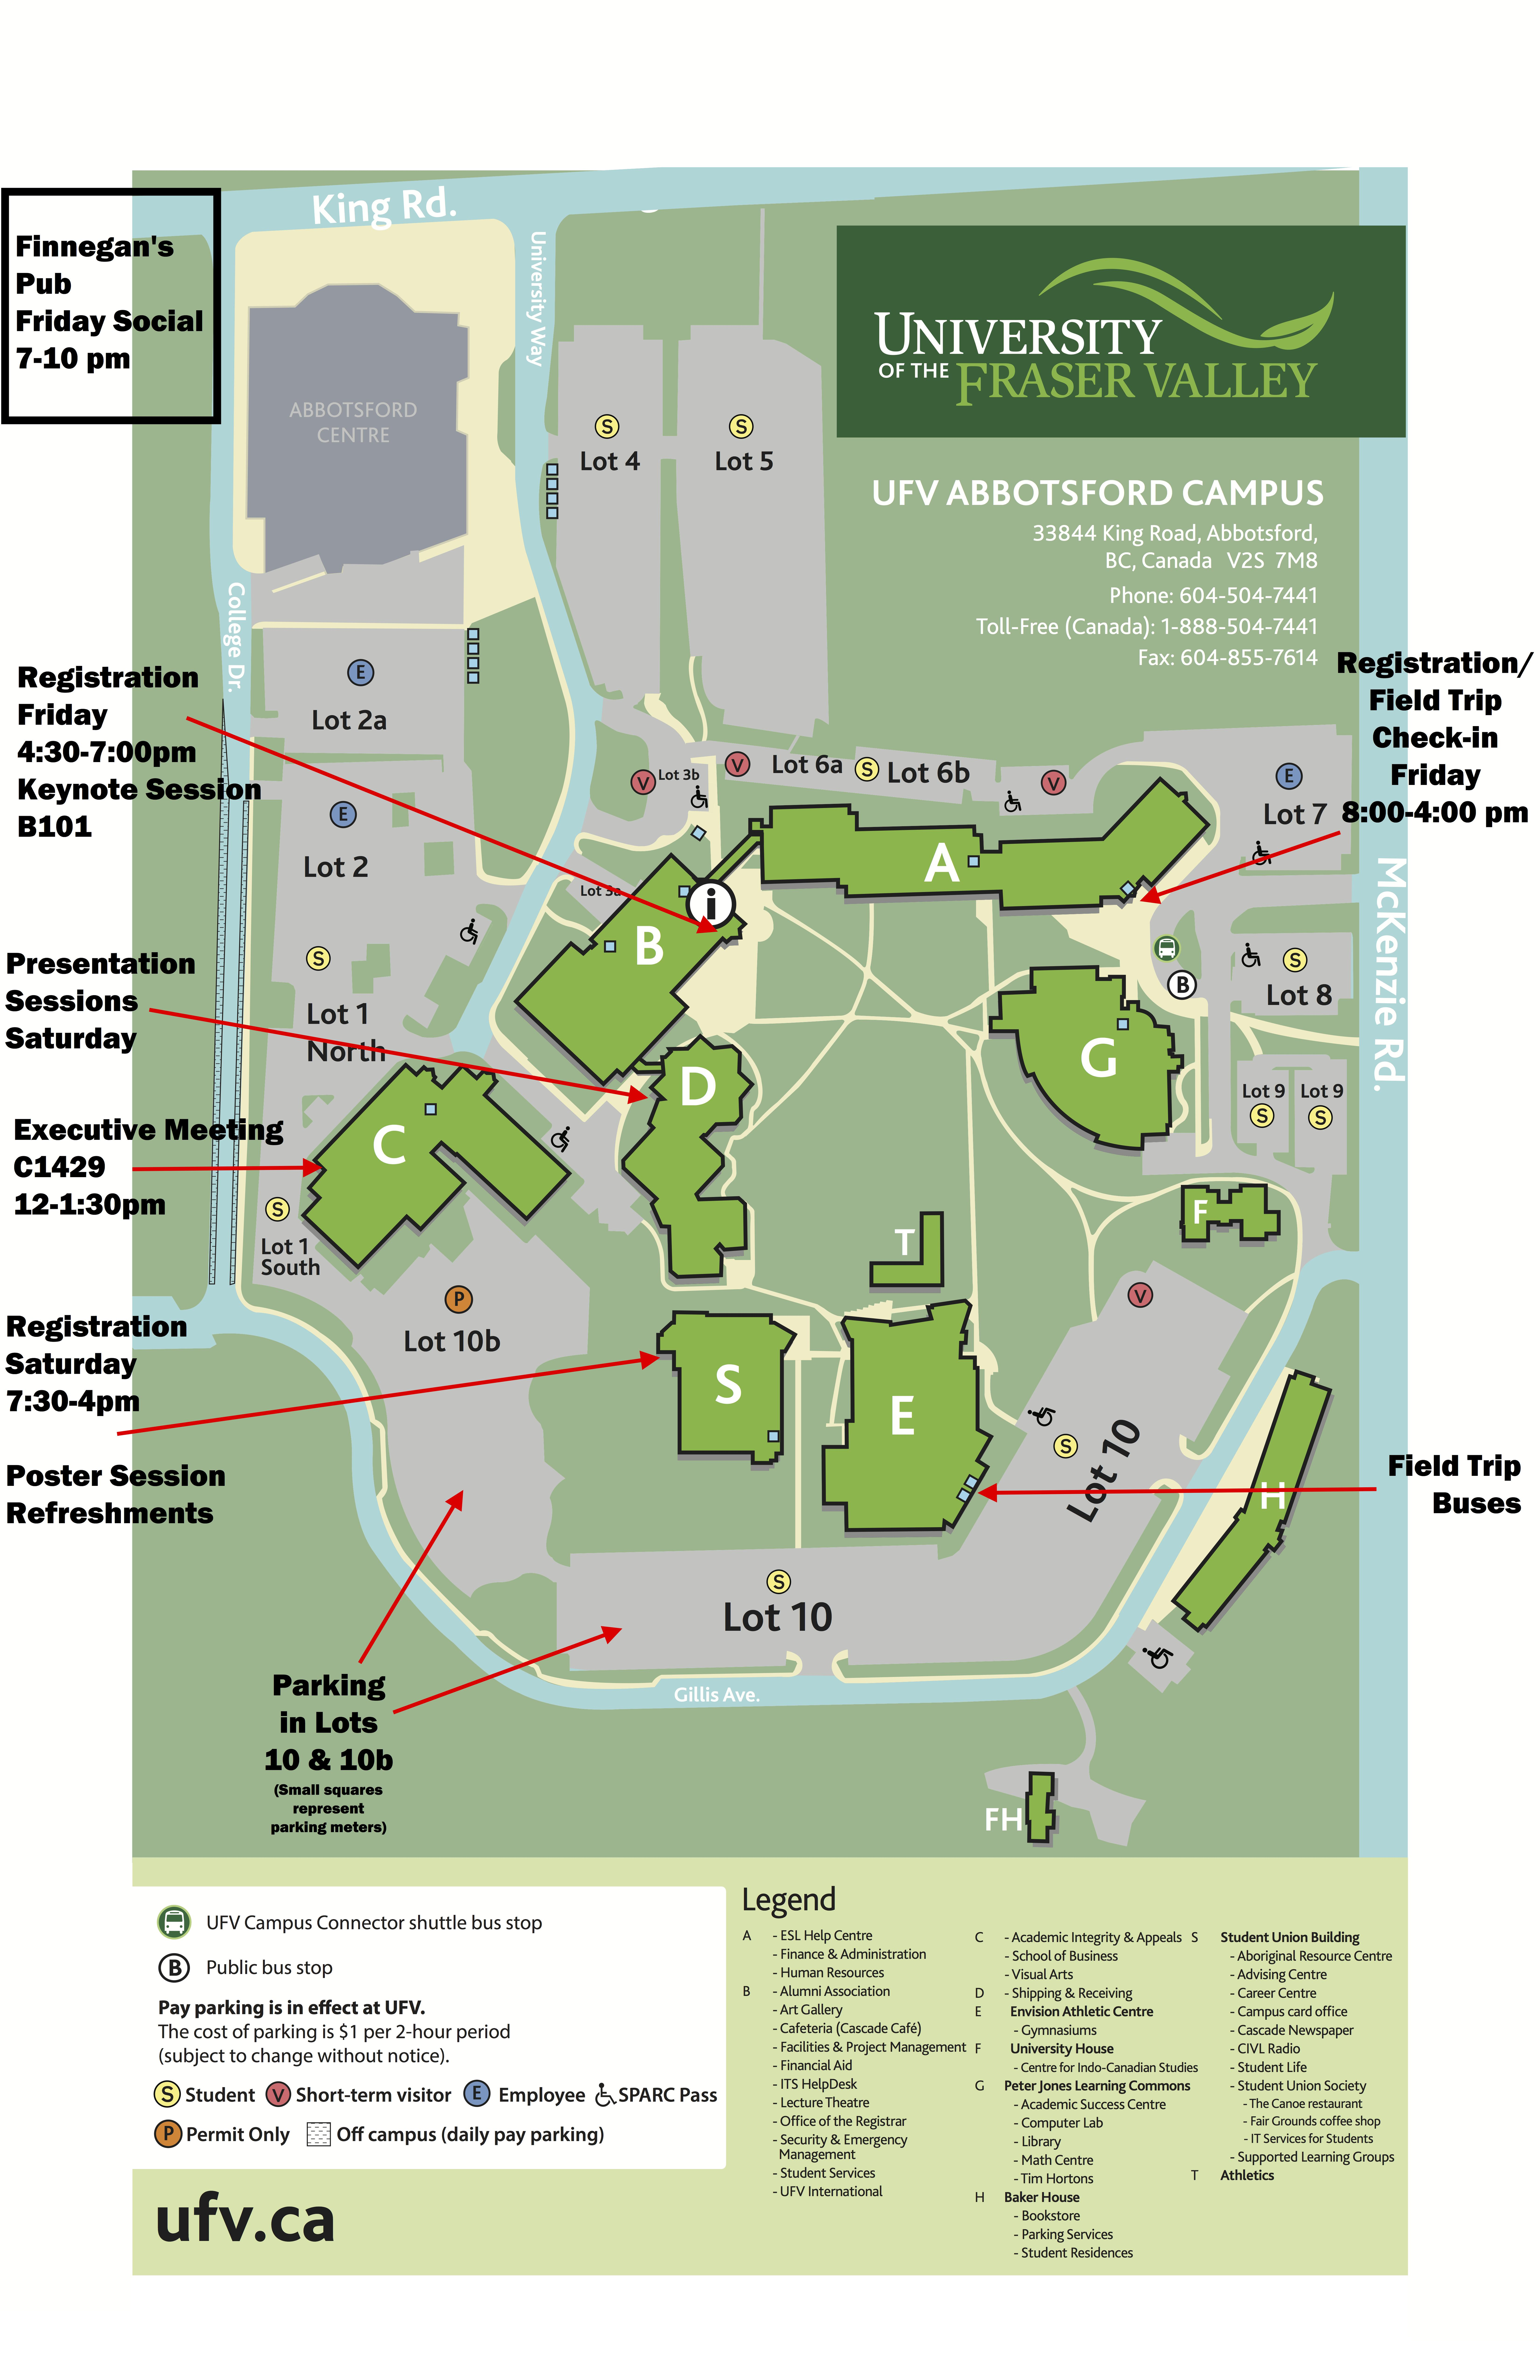 Western Washington University Campus Map – AGCReWall